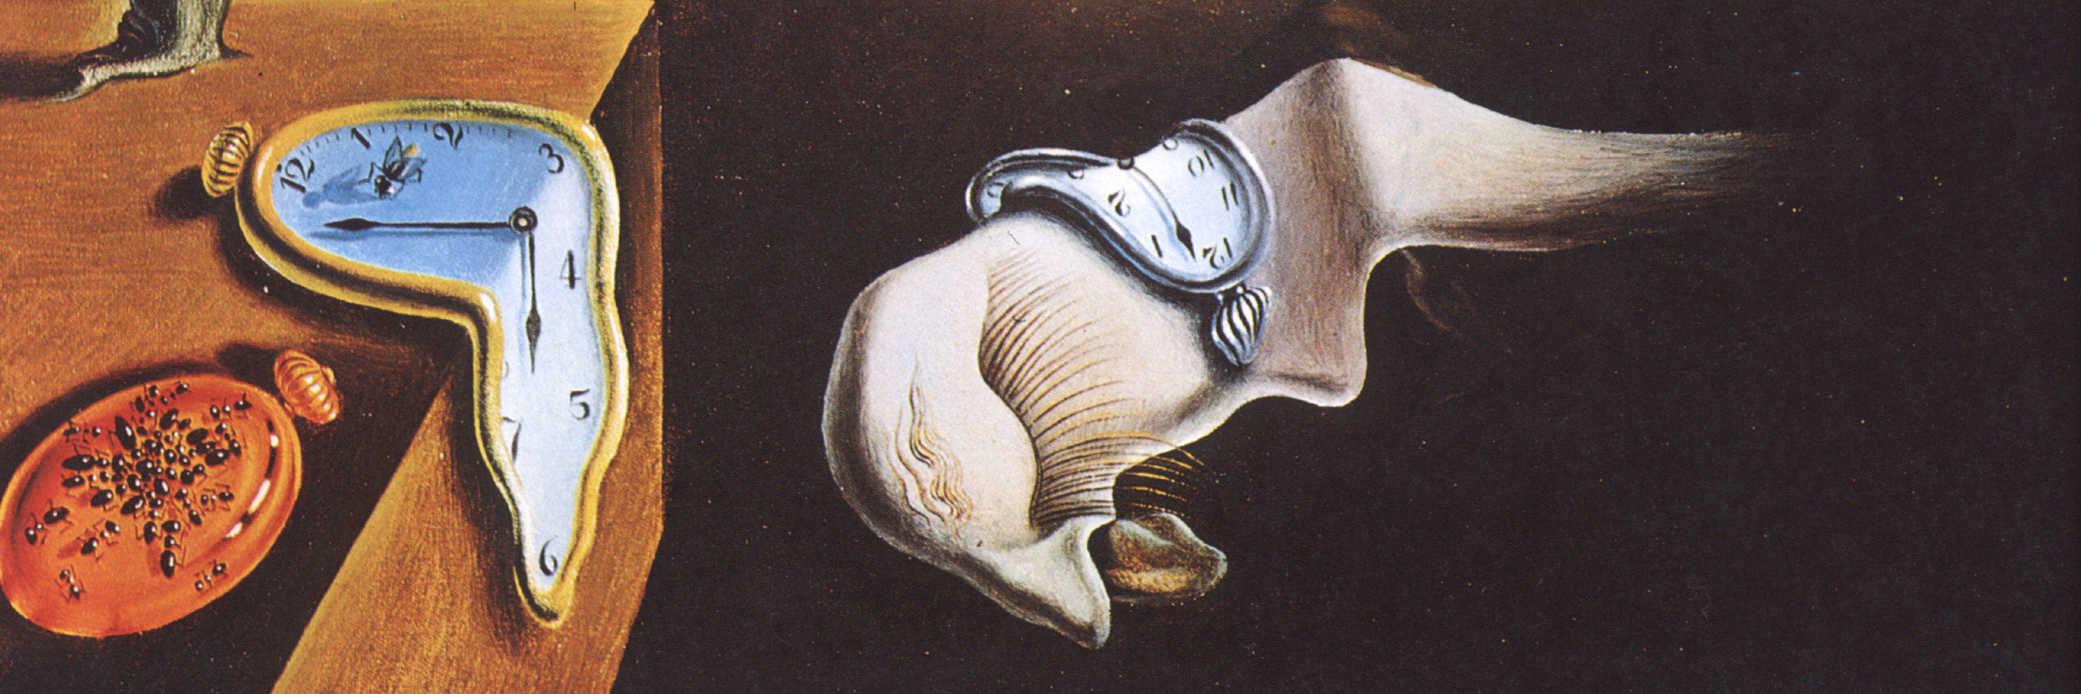 Salvador Dali's the persistence of memory.